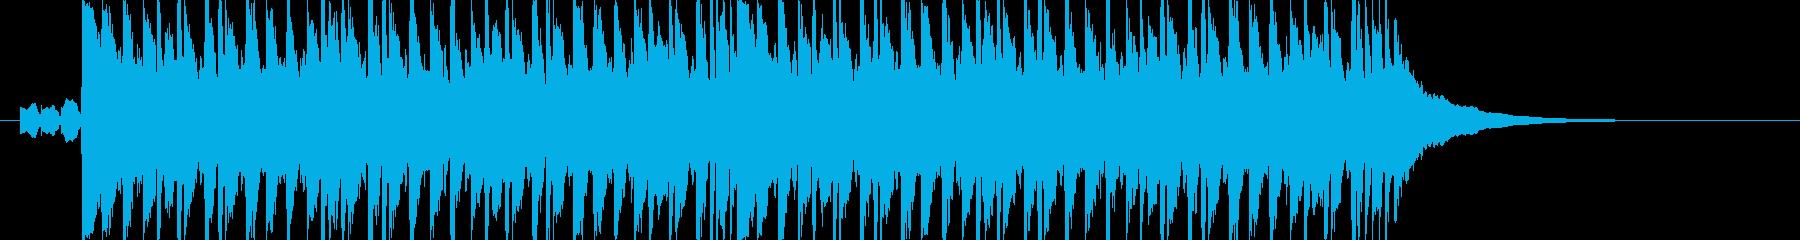 CMや映像、ハッピーなウクレレ、口笛2bの再生済みの波形